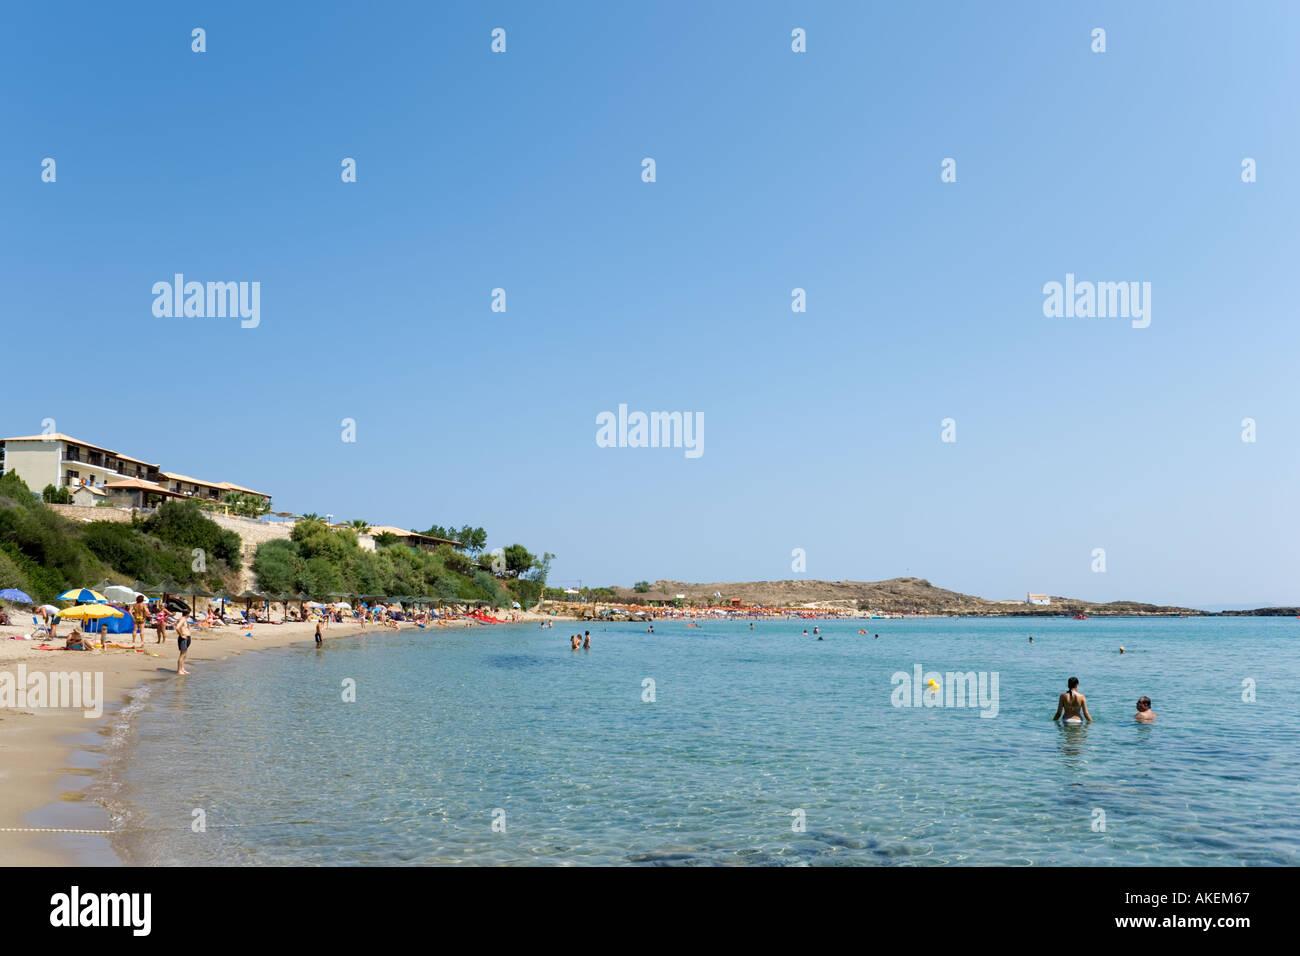 Beach at Aghios Nikolaos (St Nicholas), Zakynthos (Zante), Ionian Islands, Greece - Stock Image